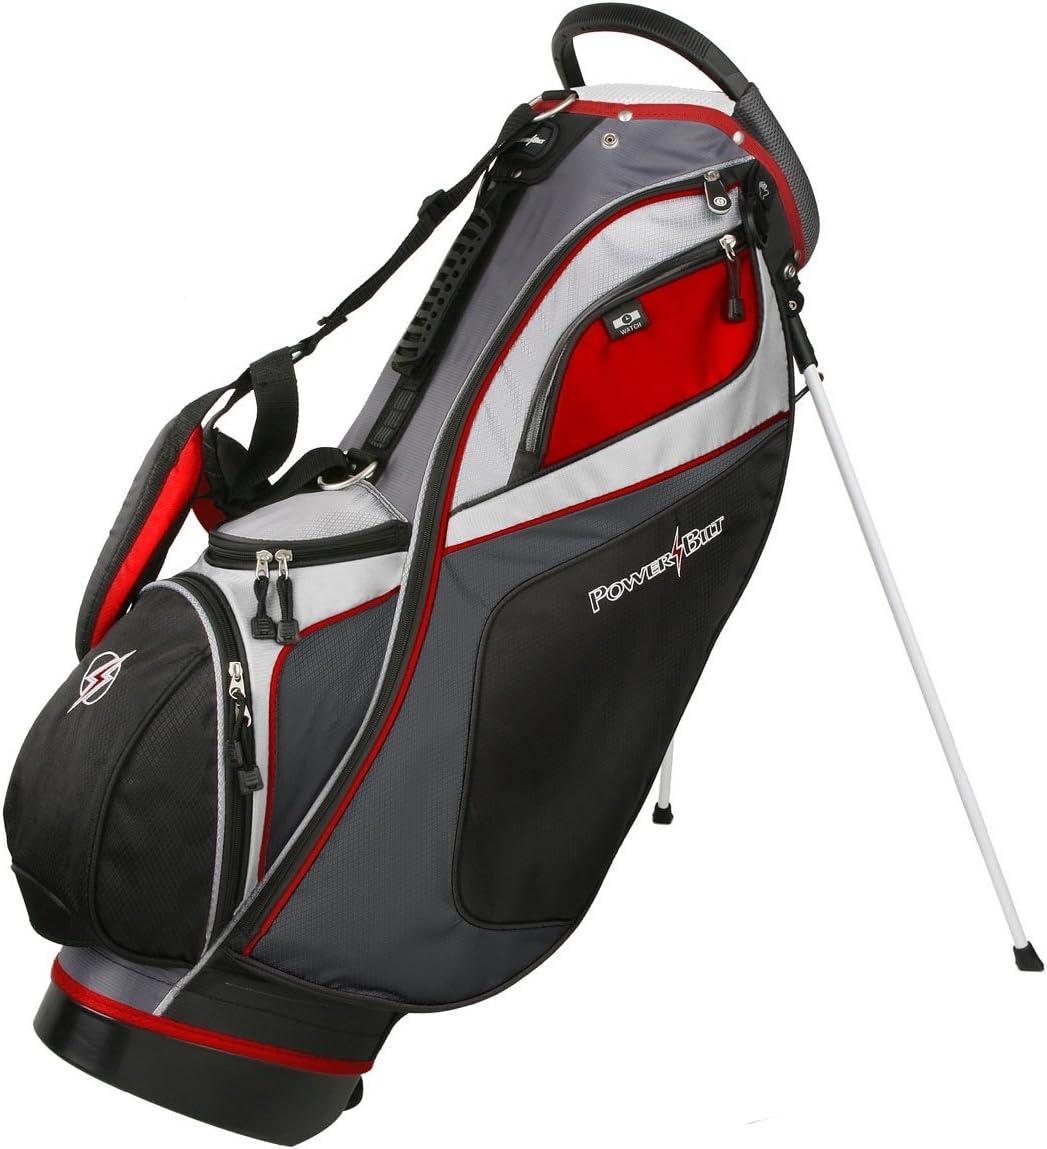 Powerbilt TPS Dunes 14-Way Black/Charcoal Stand Golf Bag (Black/Charcoal) : Sports & Outdoors